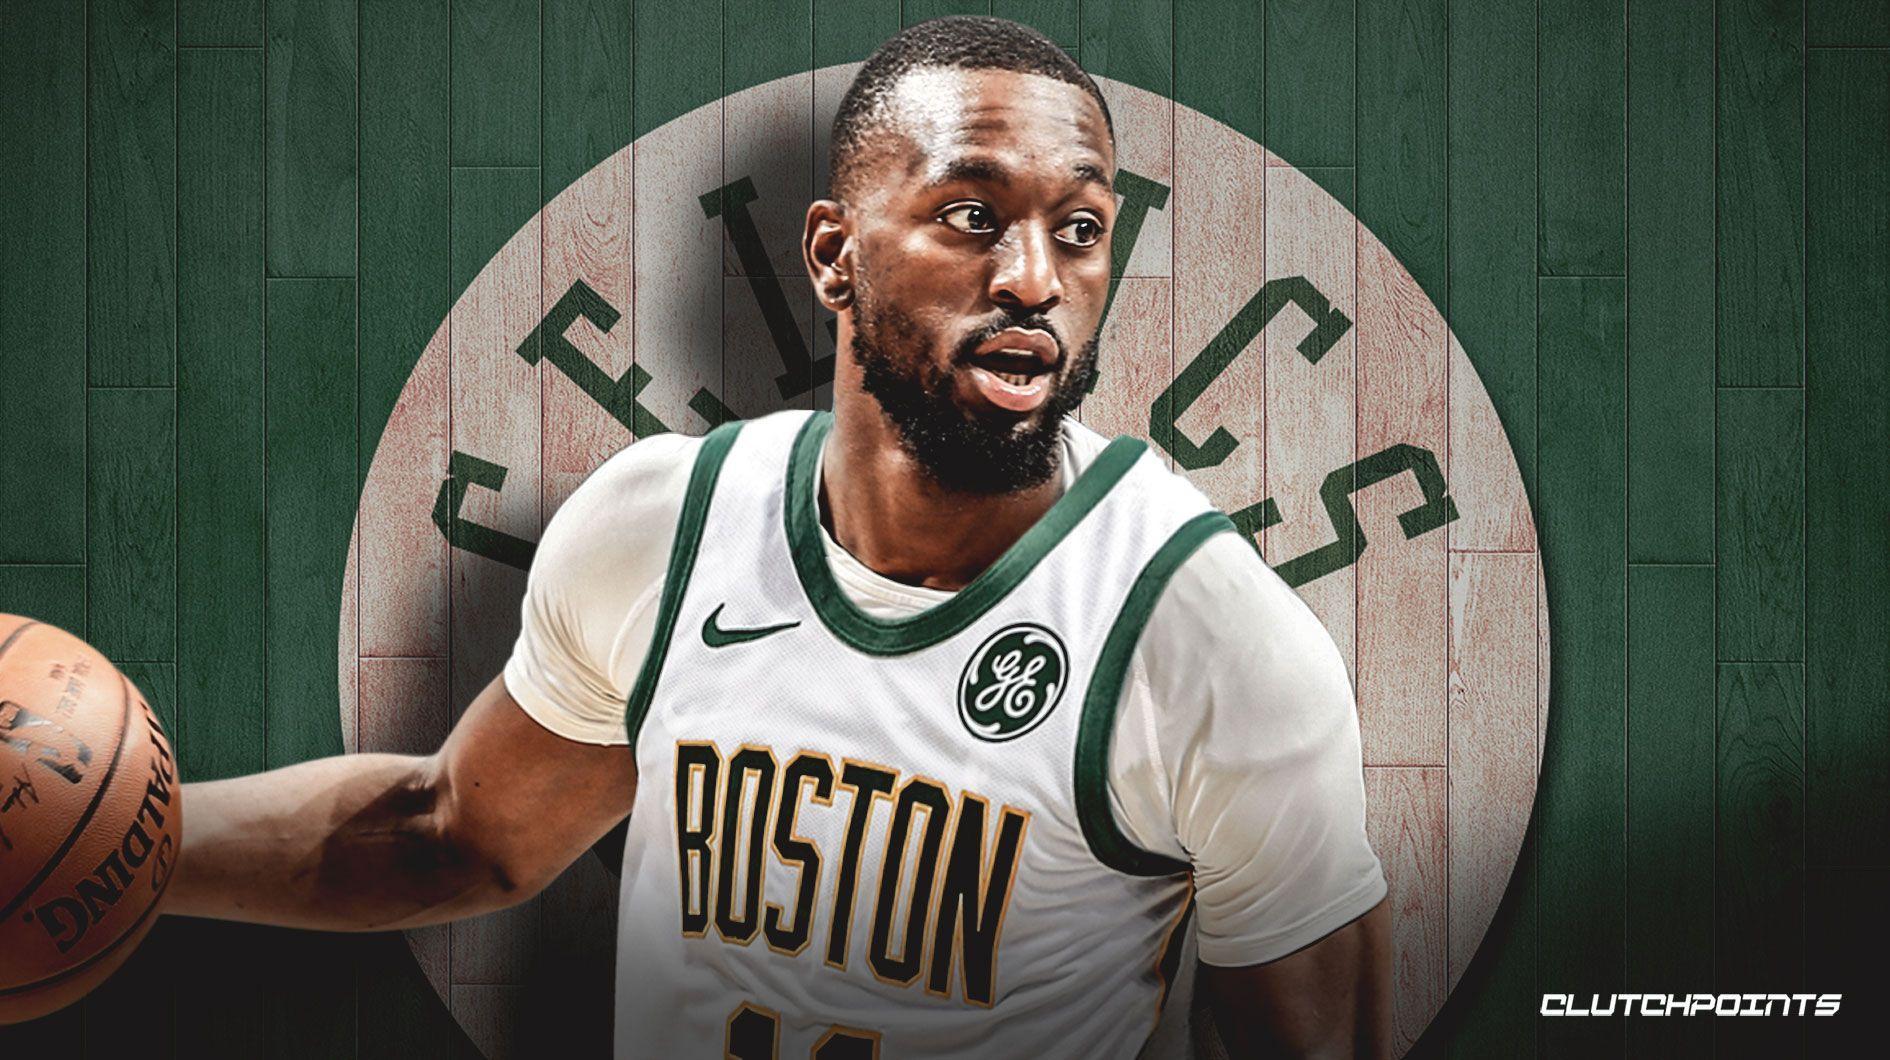 Kemba Walker Celtics Wallpapers Top Free Kemba Walker Celtics Backgrounds Wallpaperaccess